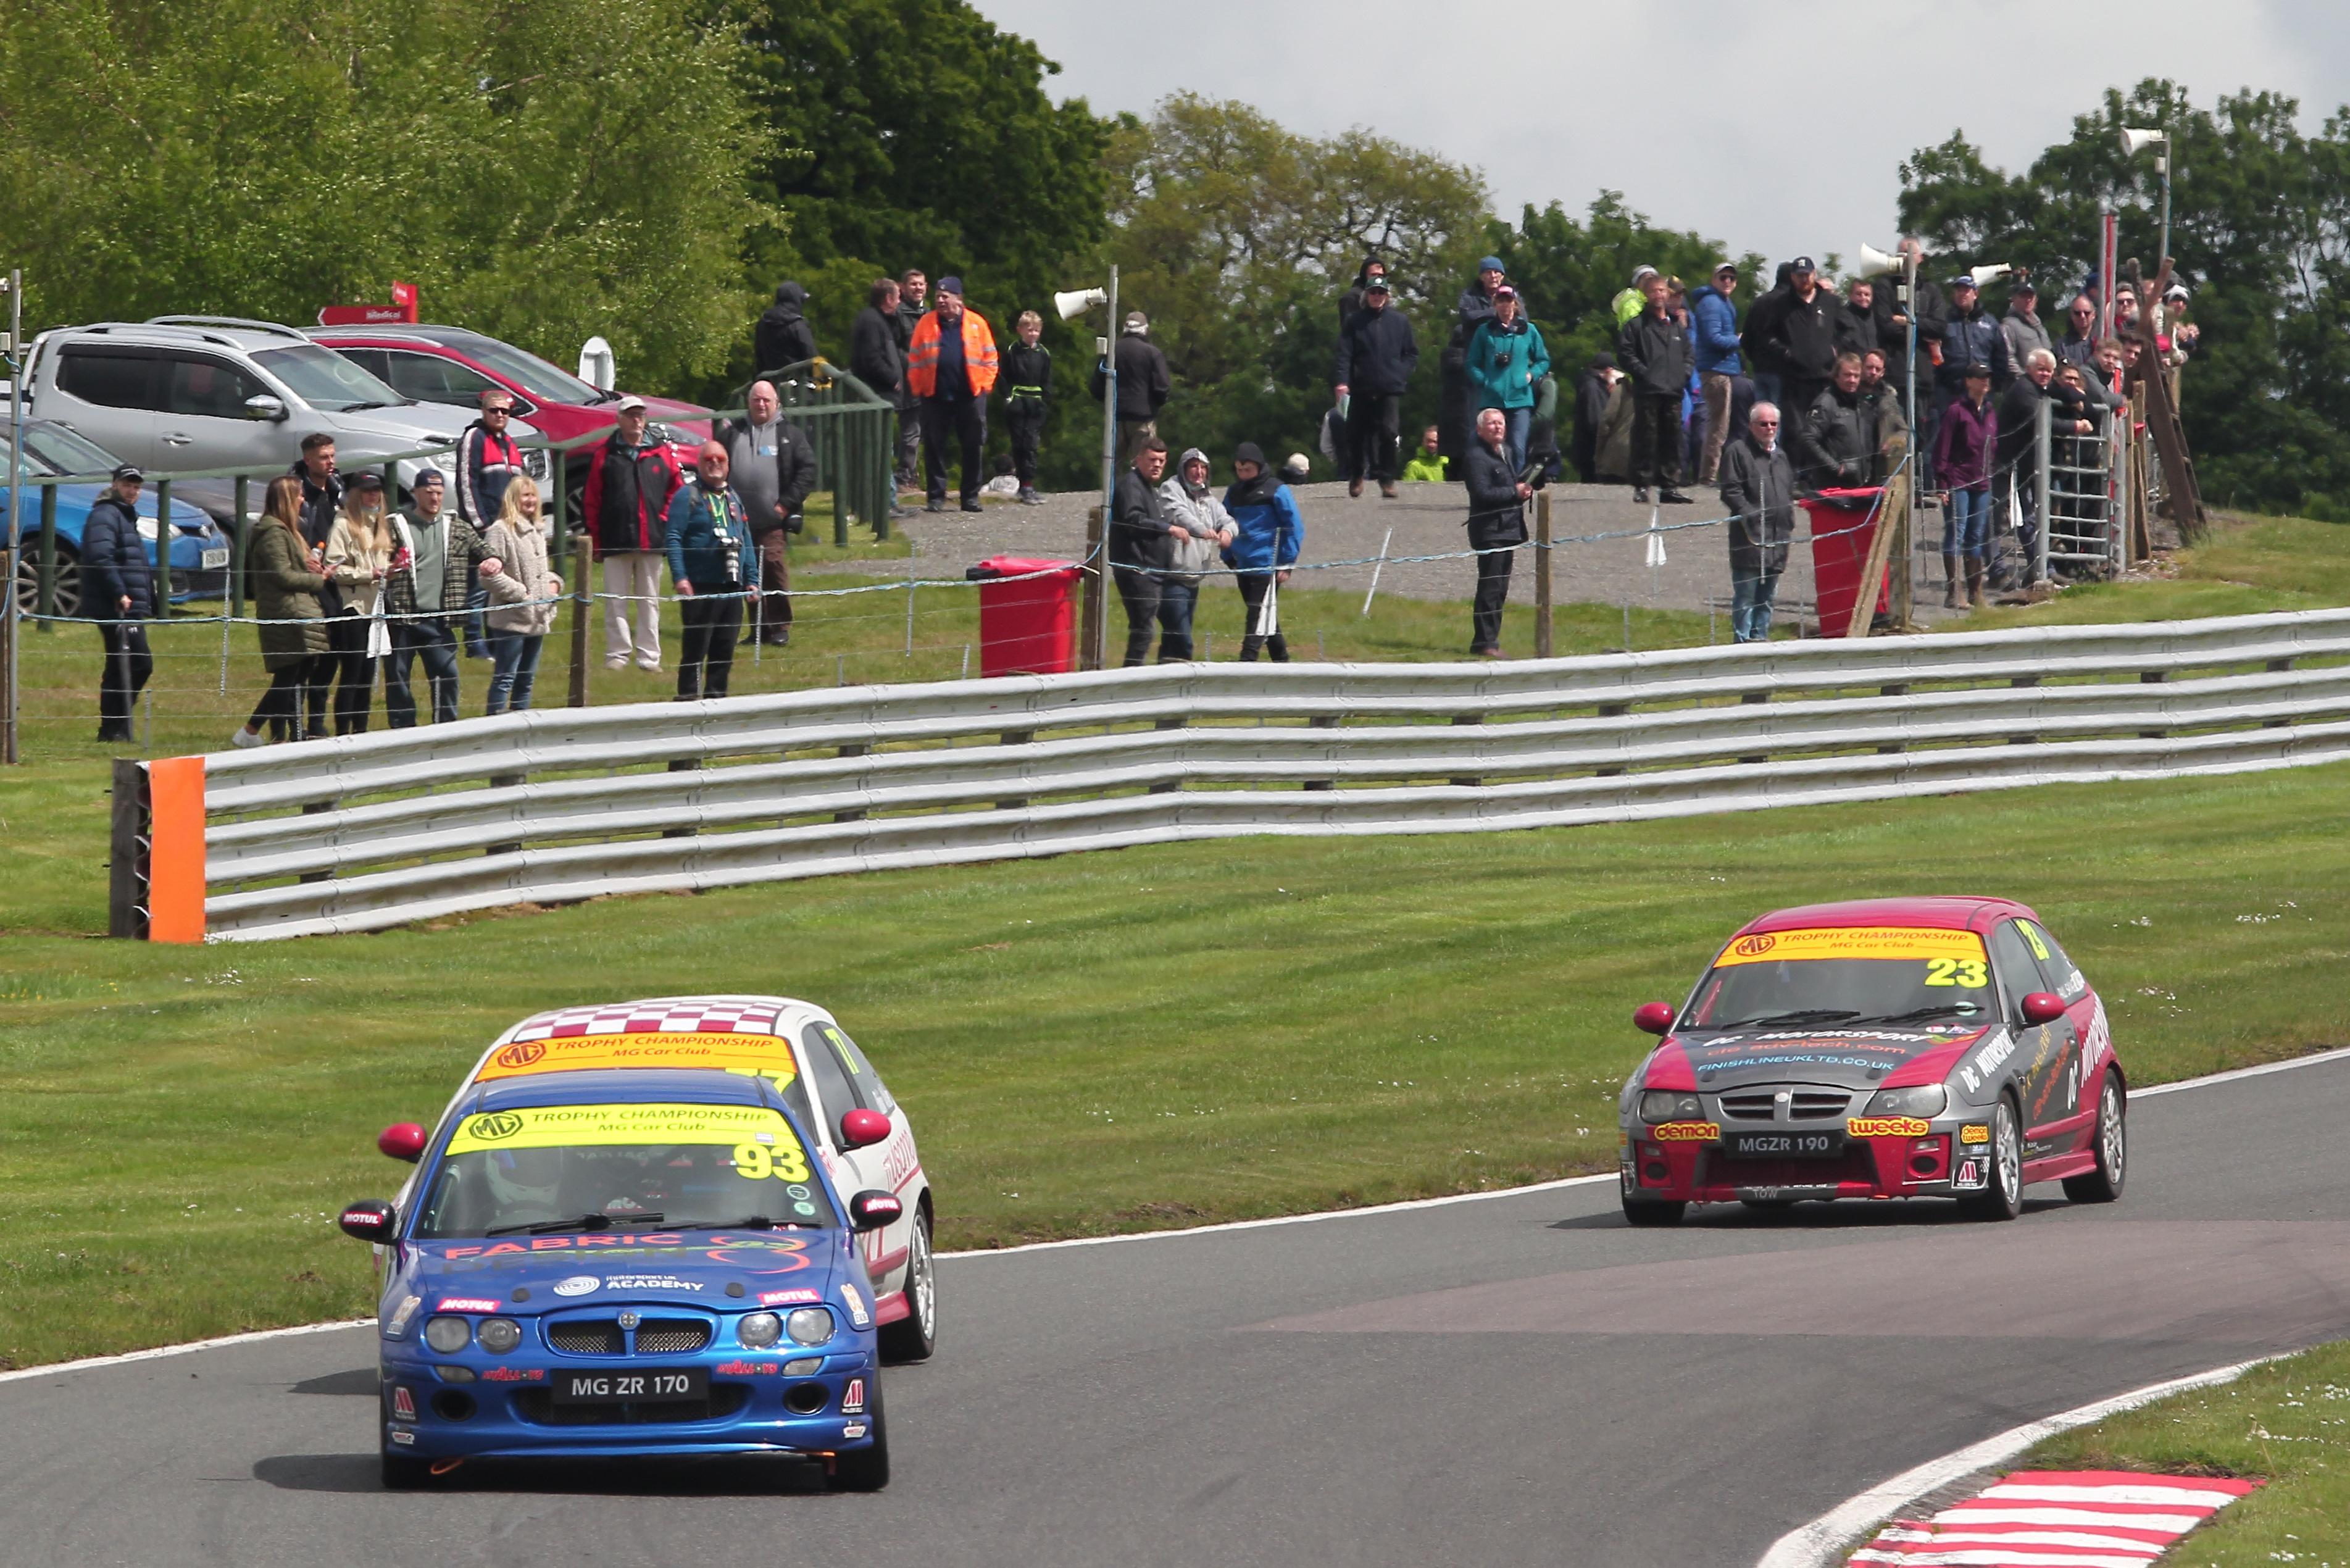 Spectators were back at Oulton Park for last weekend's MGCC event